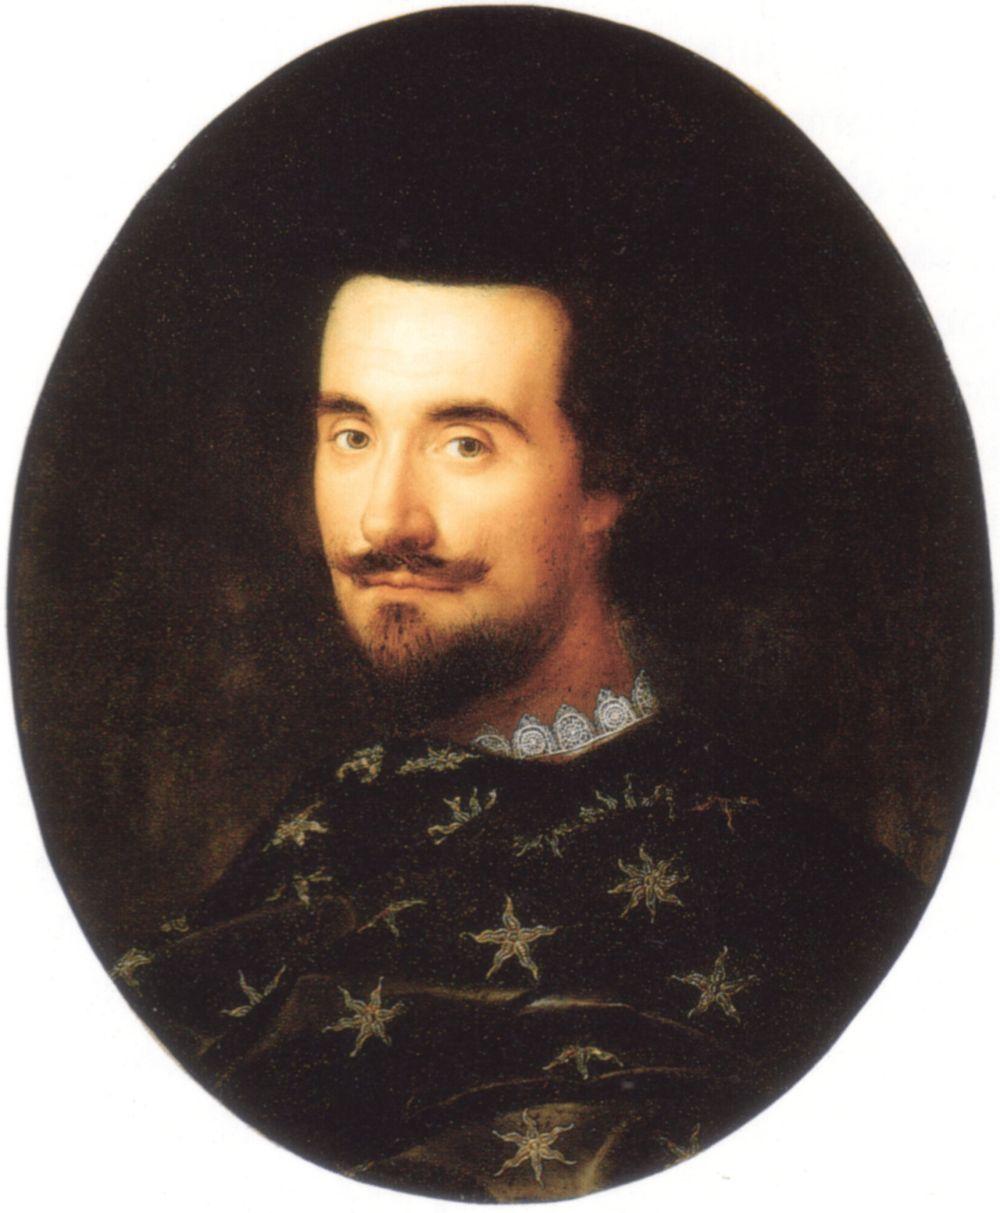 Эдуард, 1-й барон Герберт из Чербери Герберт,